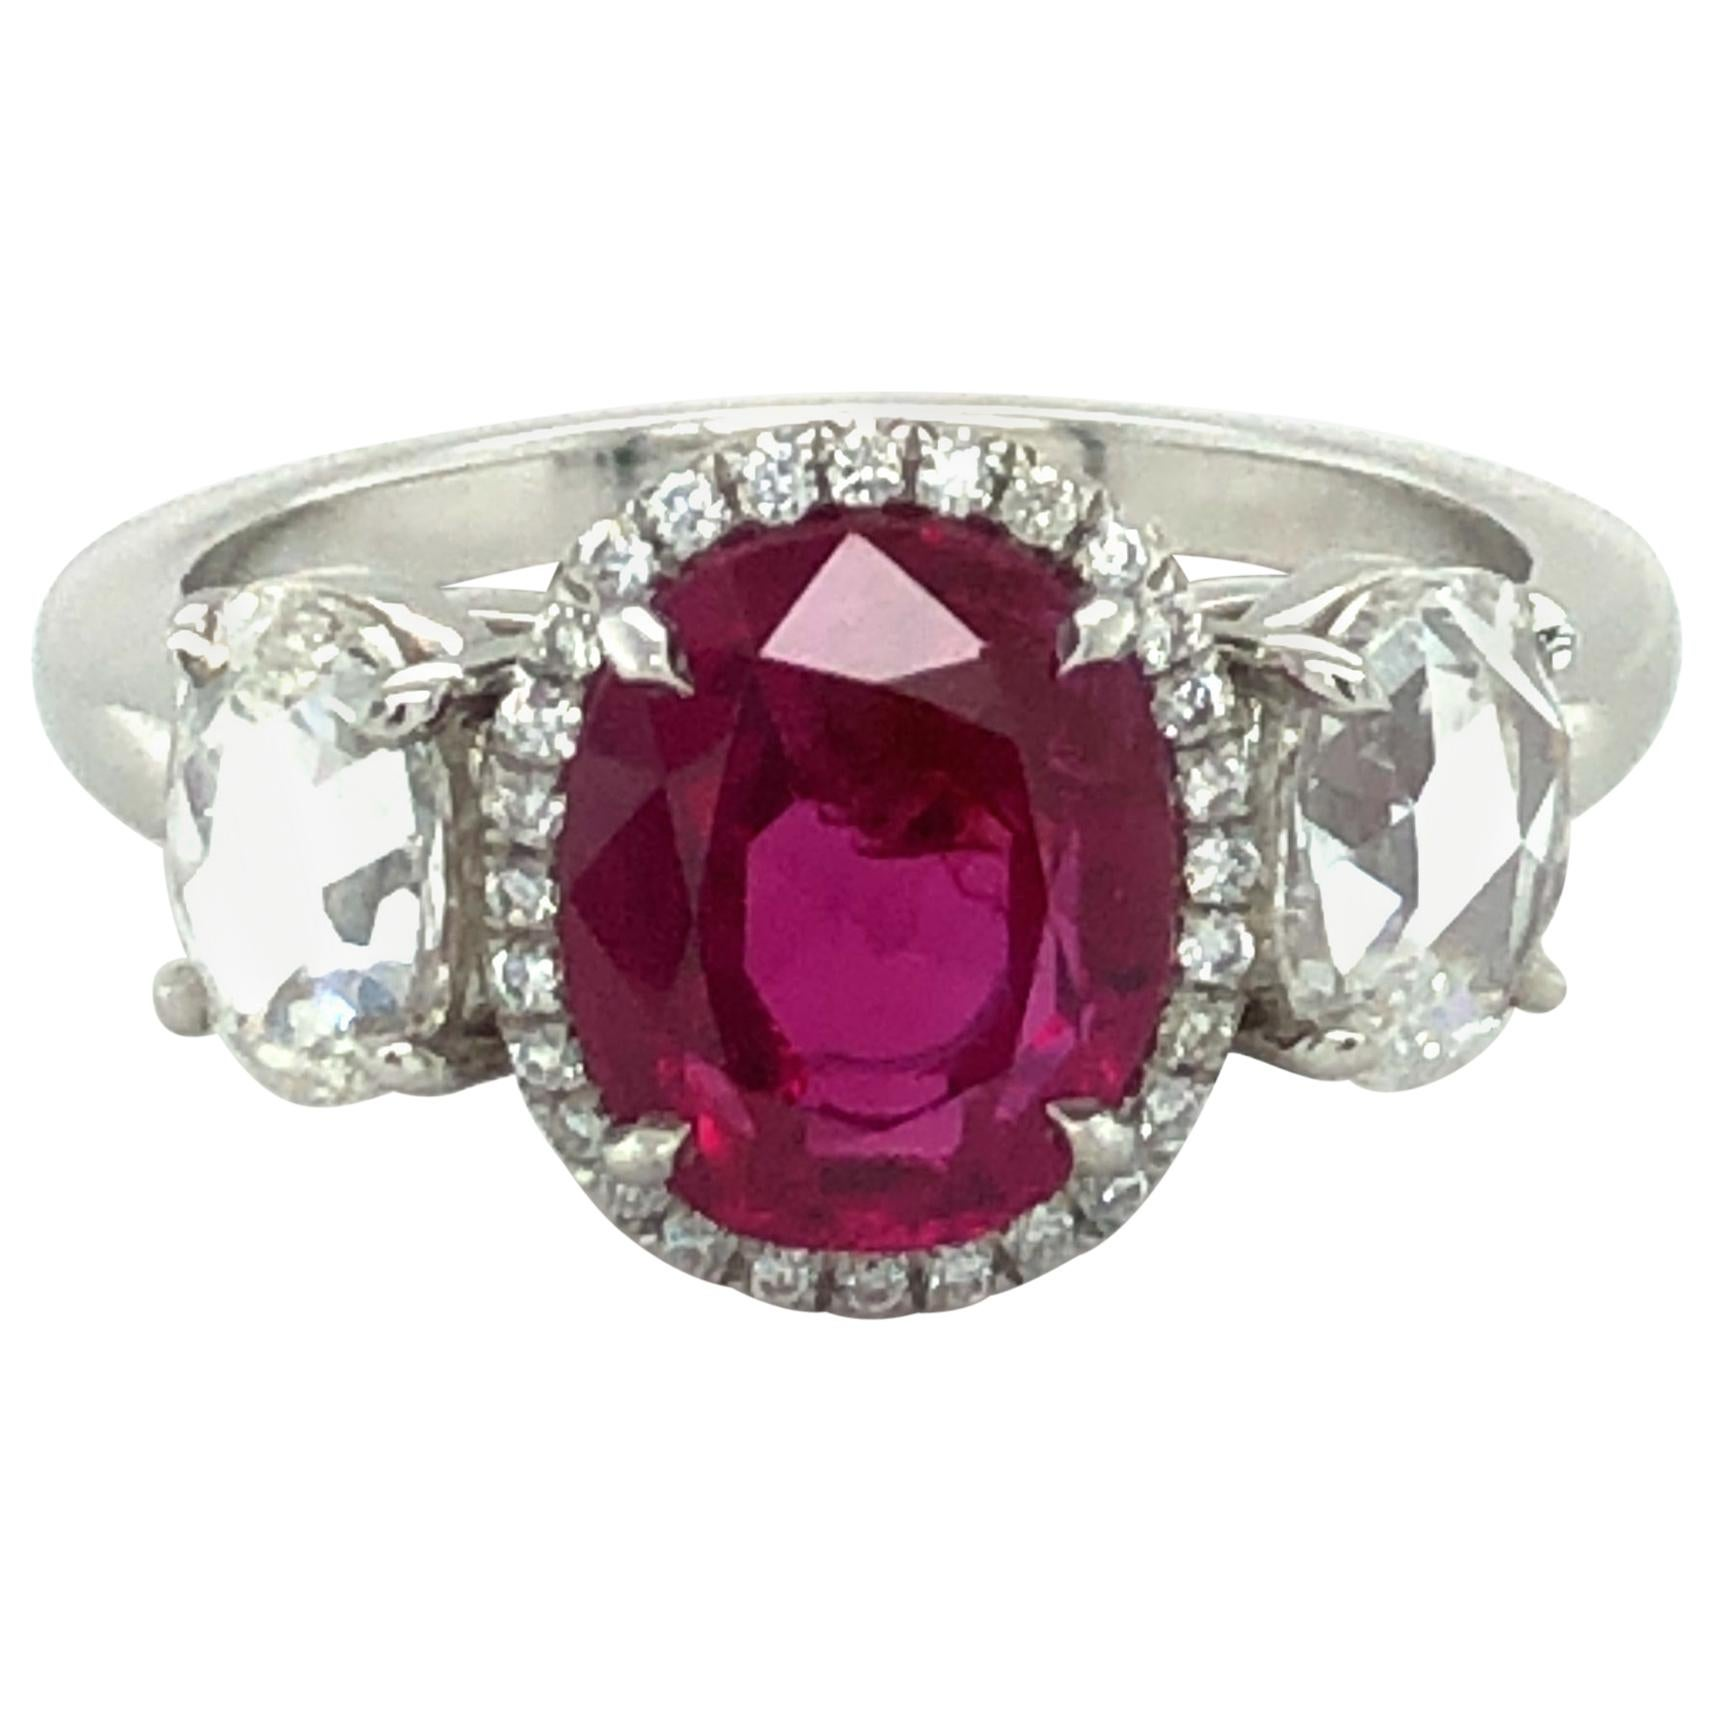 Superb 2.73 Carat Burma Ruby and Diamond Ring in Platinum 950